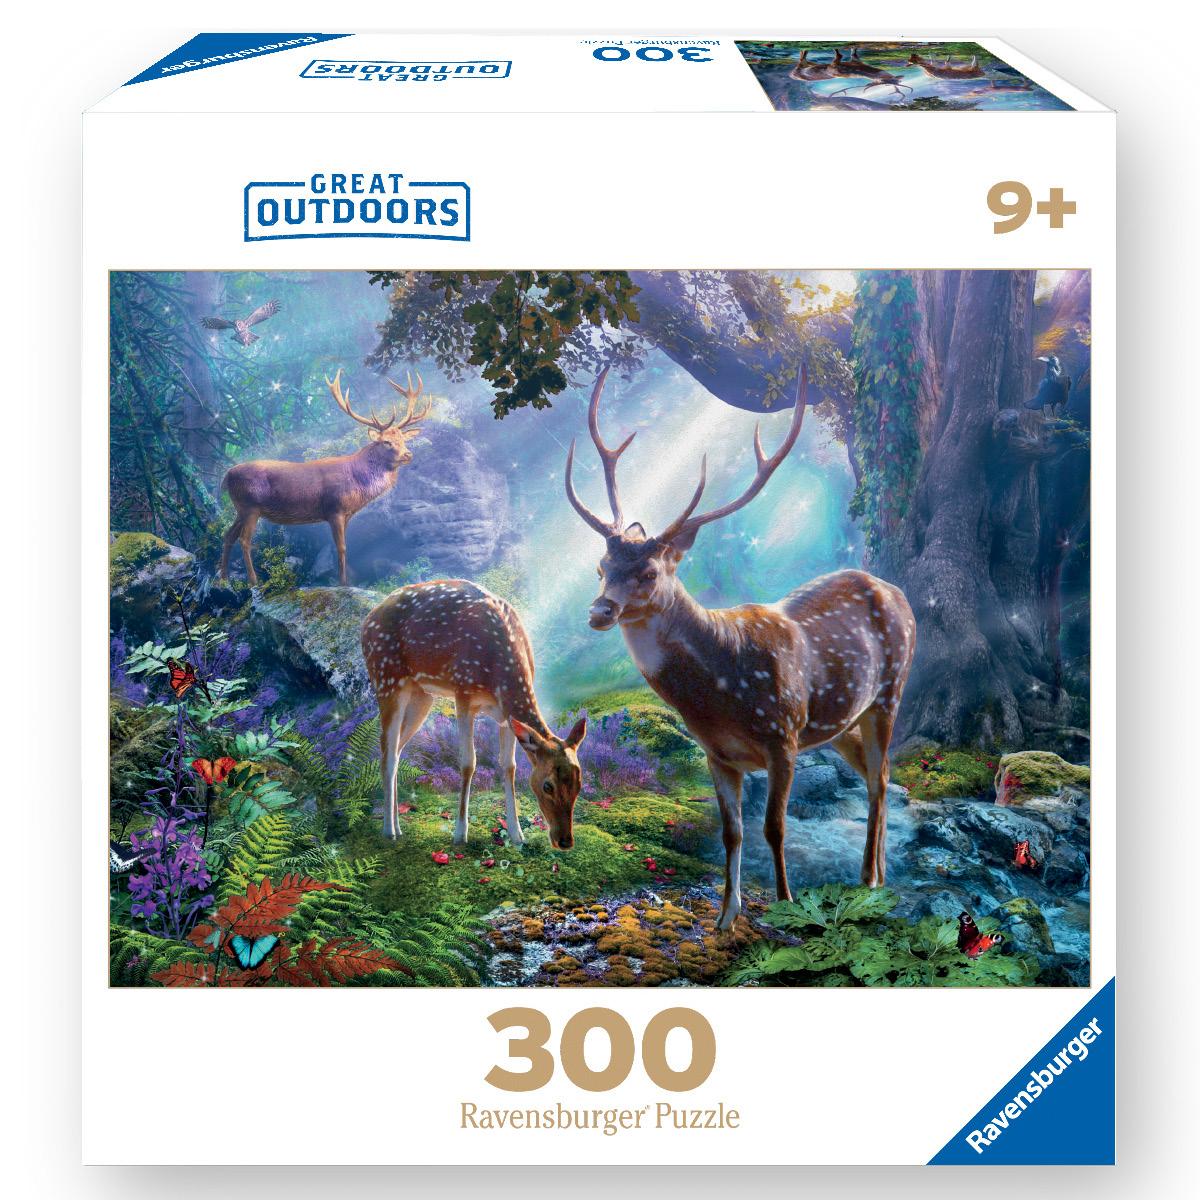 300 Piece Puzzles